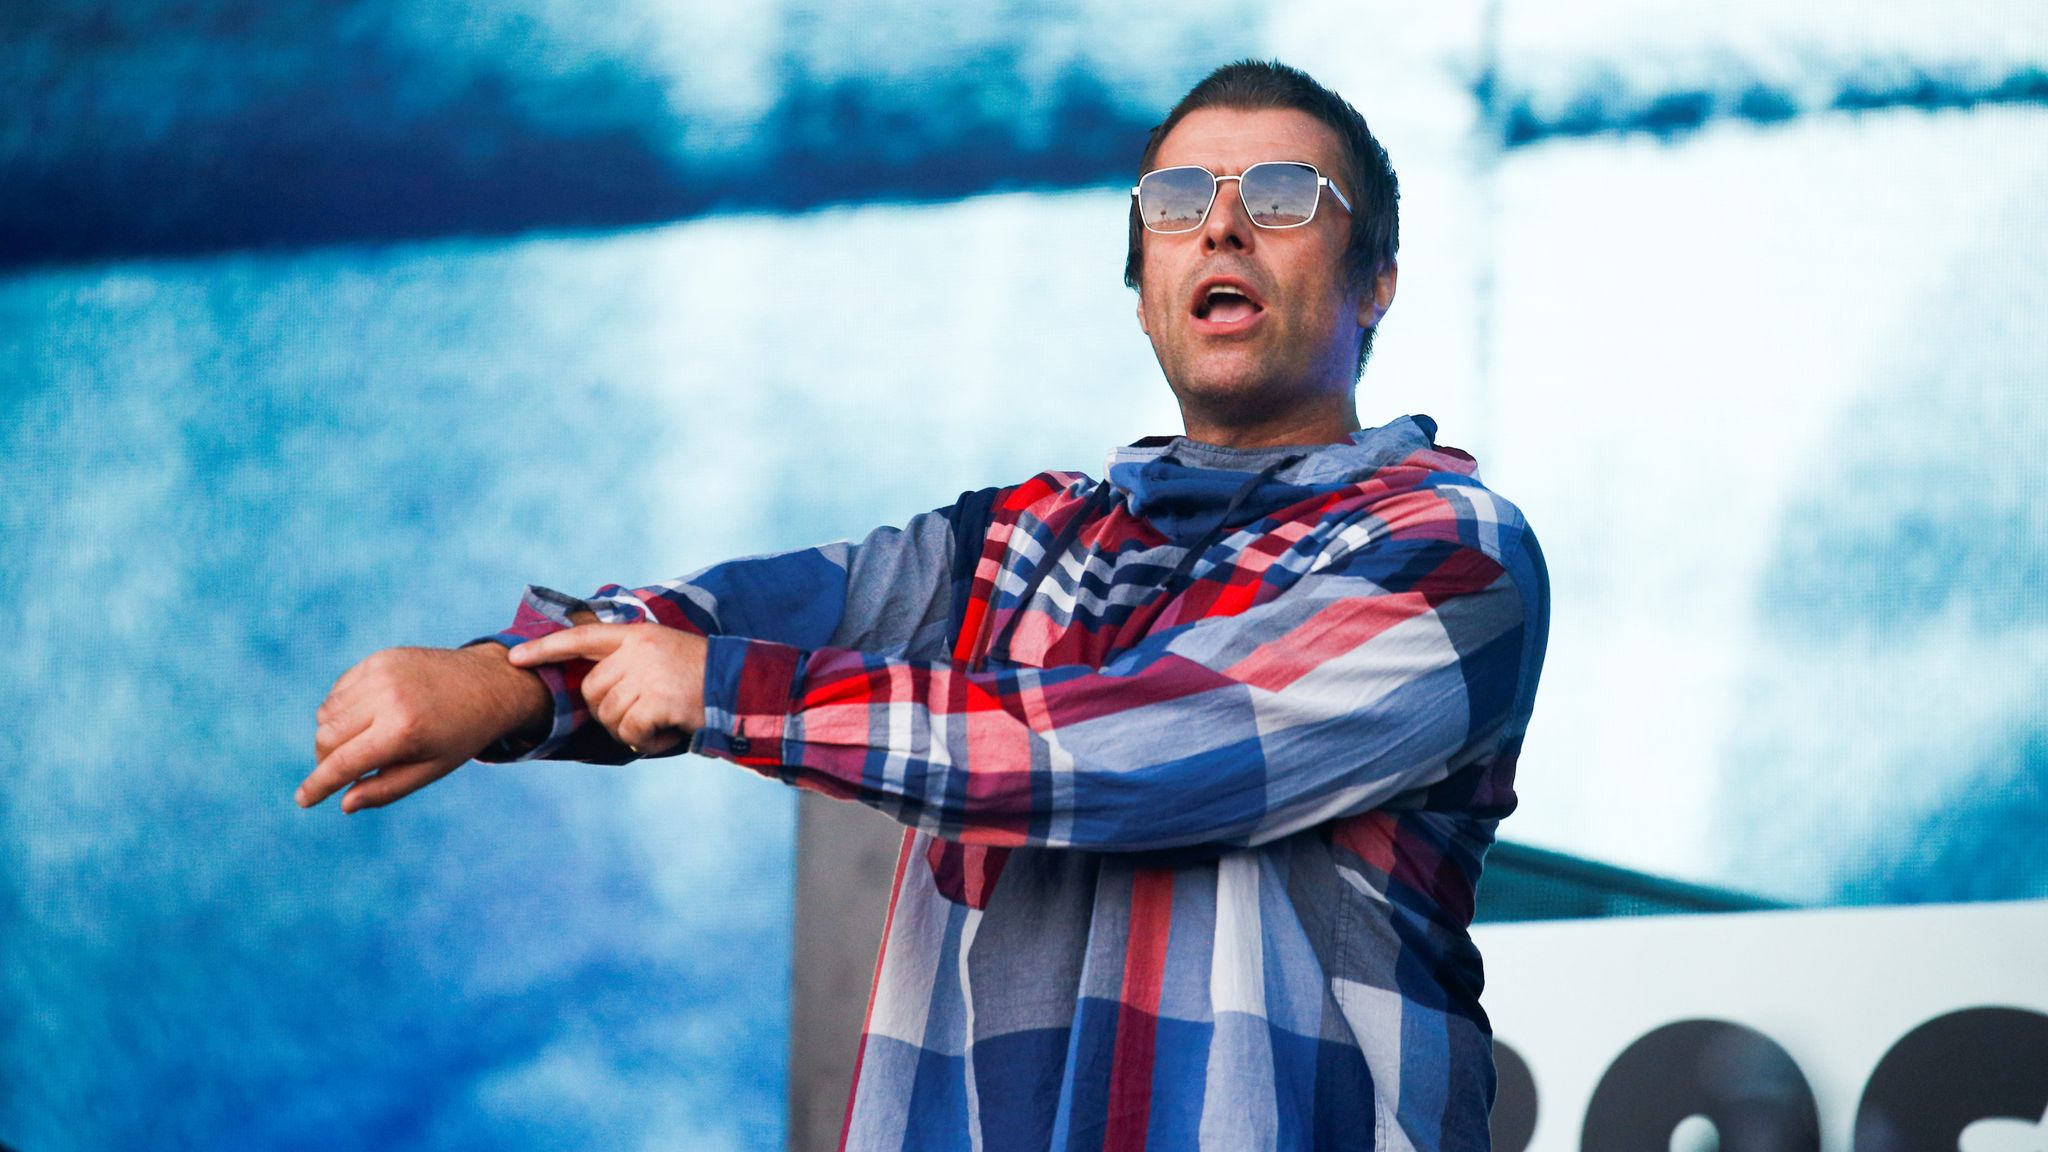 Liam Gallagher on stage at Glastonbury 2019